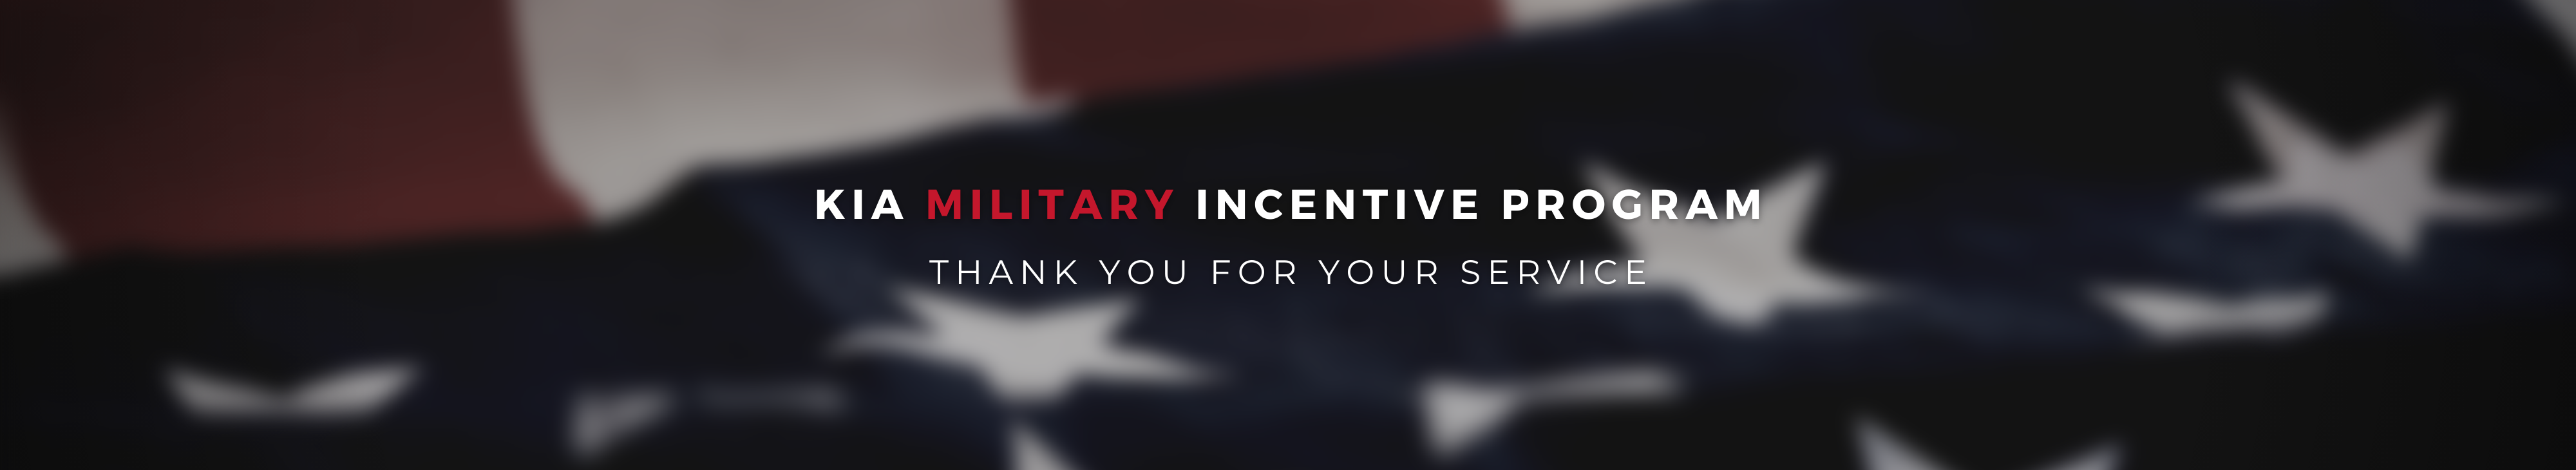 Kia Military Rebate Program